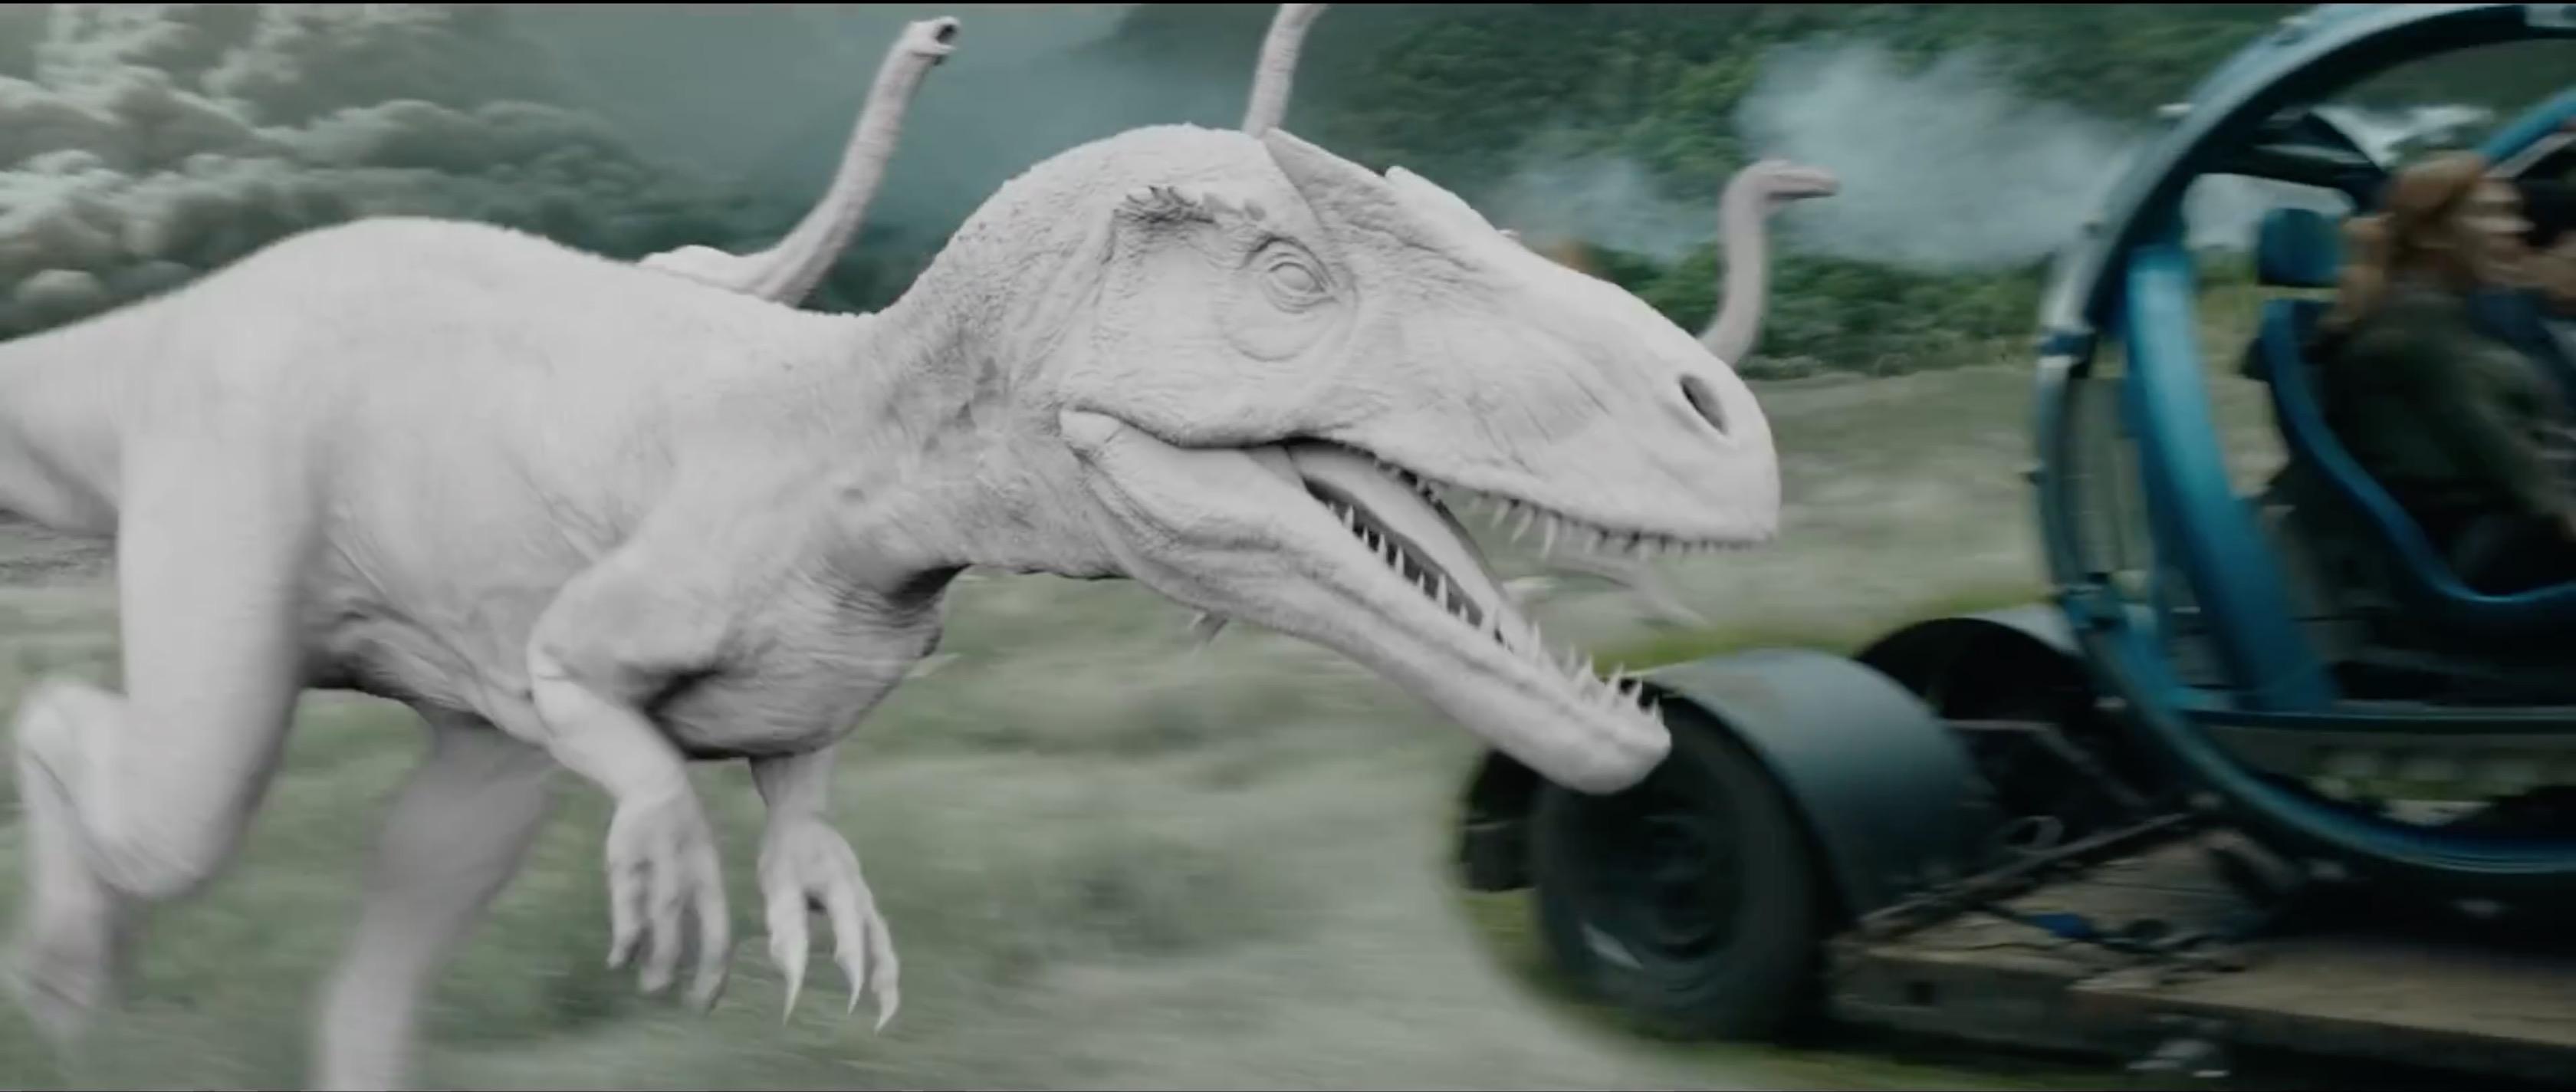 Jurassic World: Fallen Kingdom VFX Breakdown by ILM